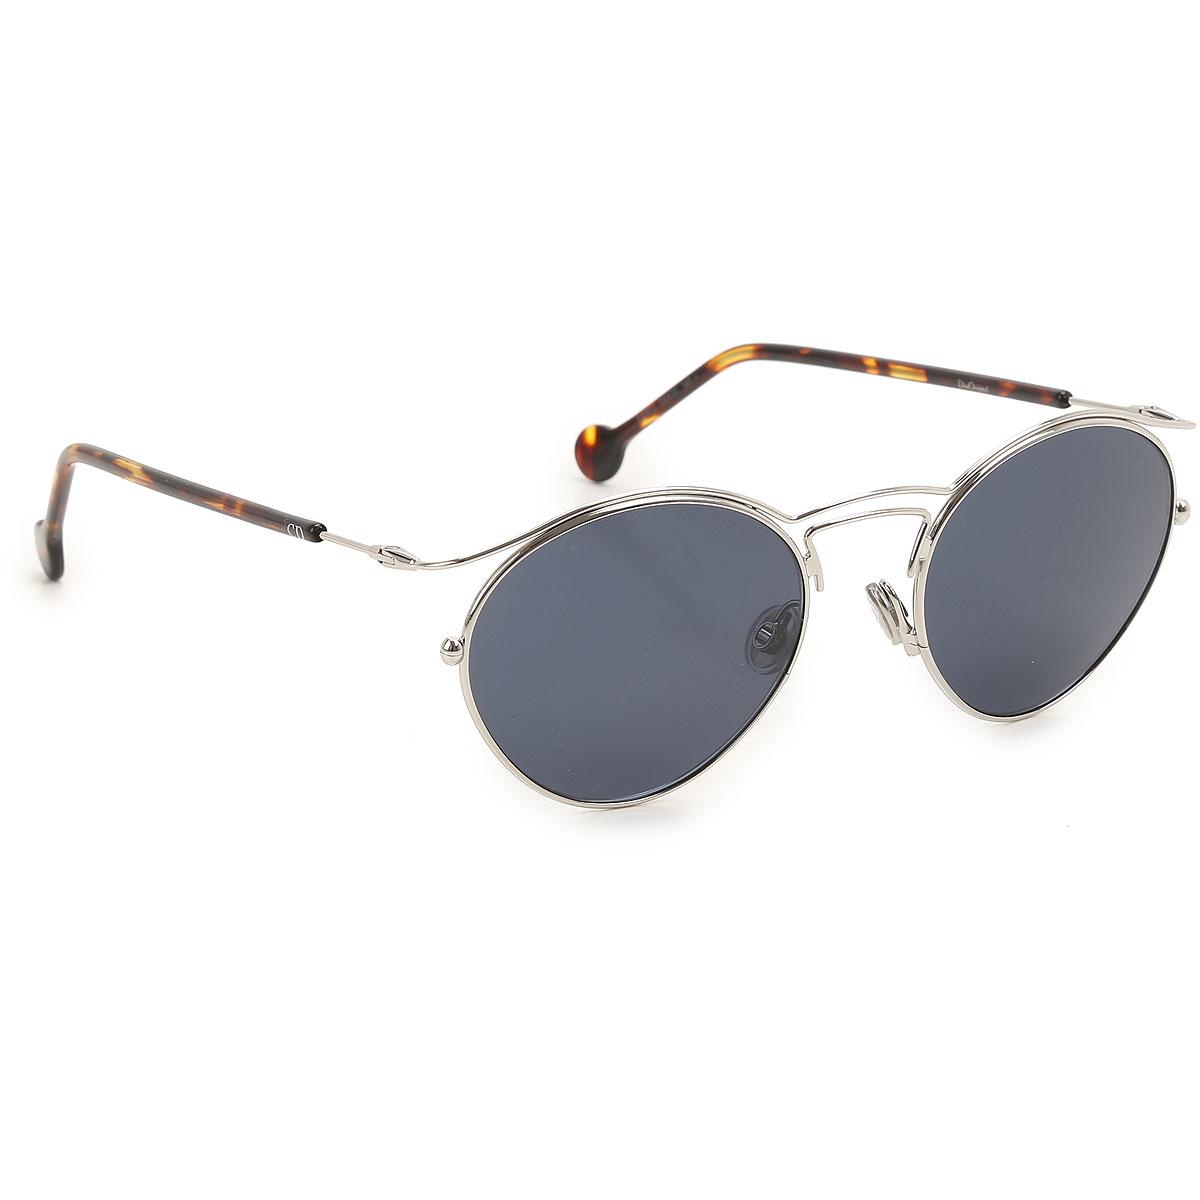 Christian Dior Sunglasses On Sale, Silver, 2019